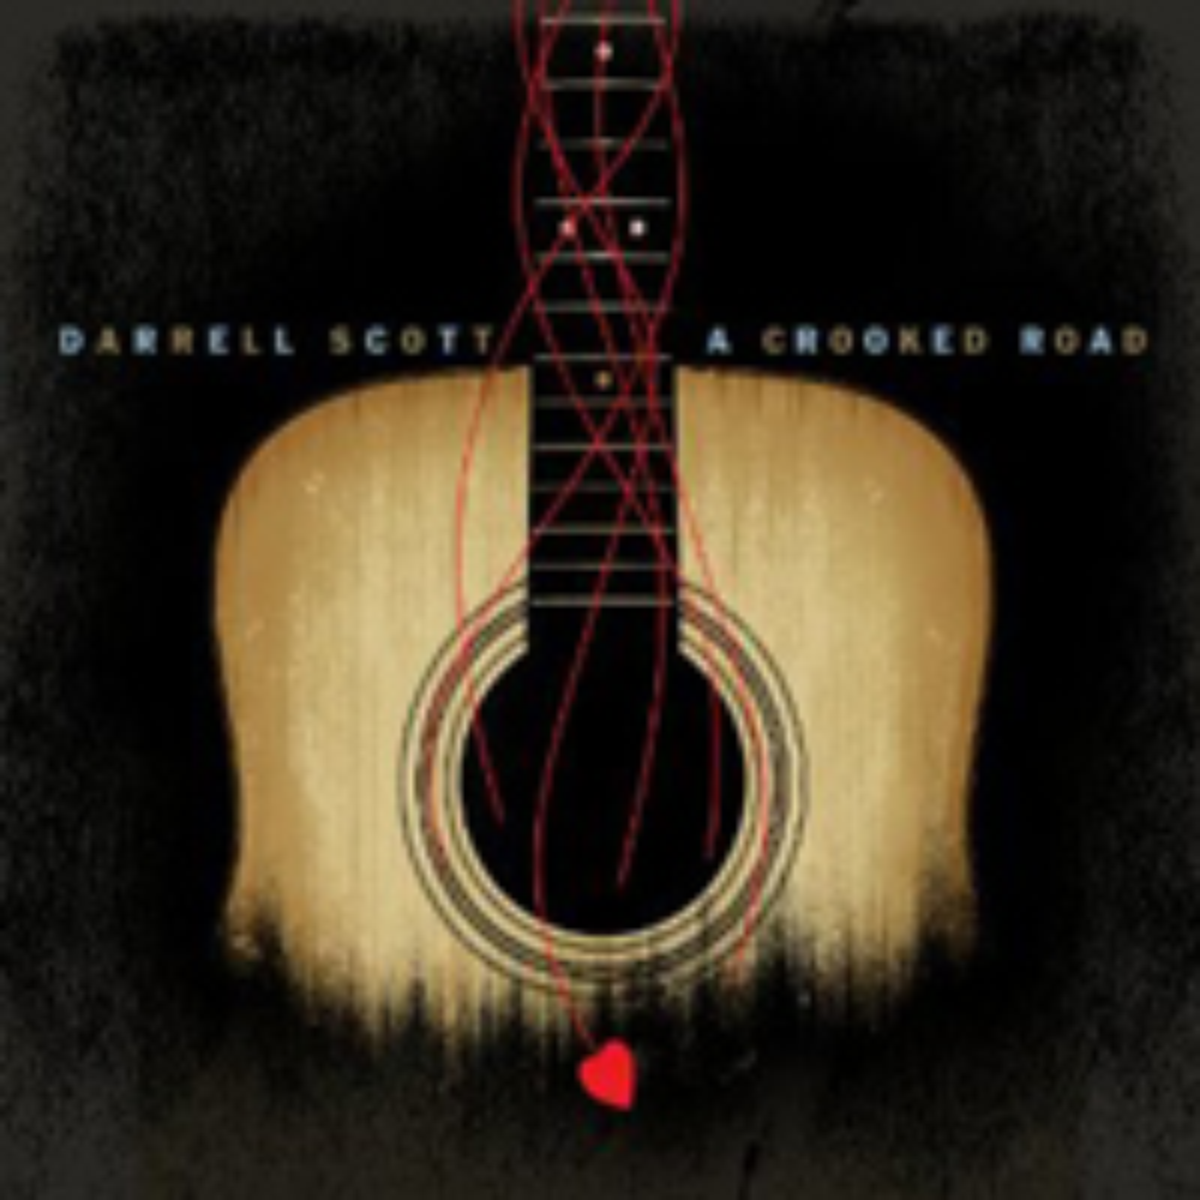 Darrell Scott, A Crooked Road